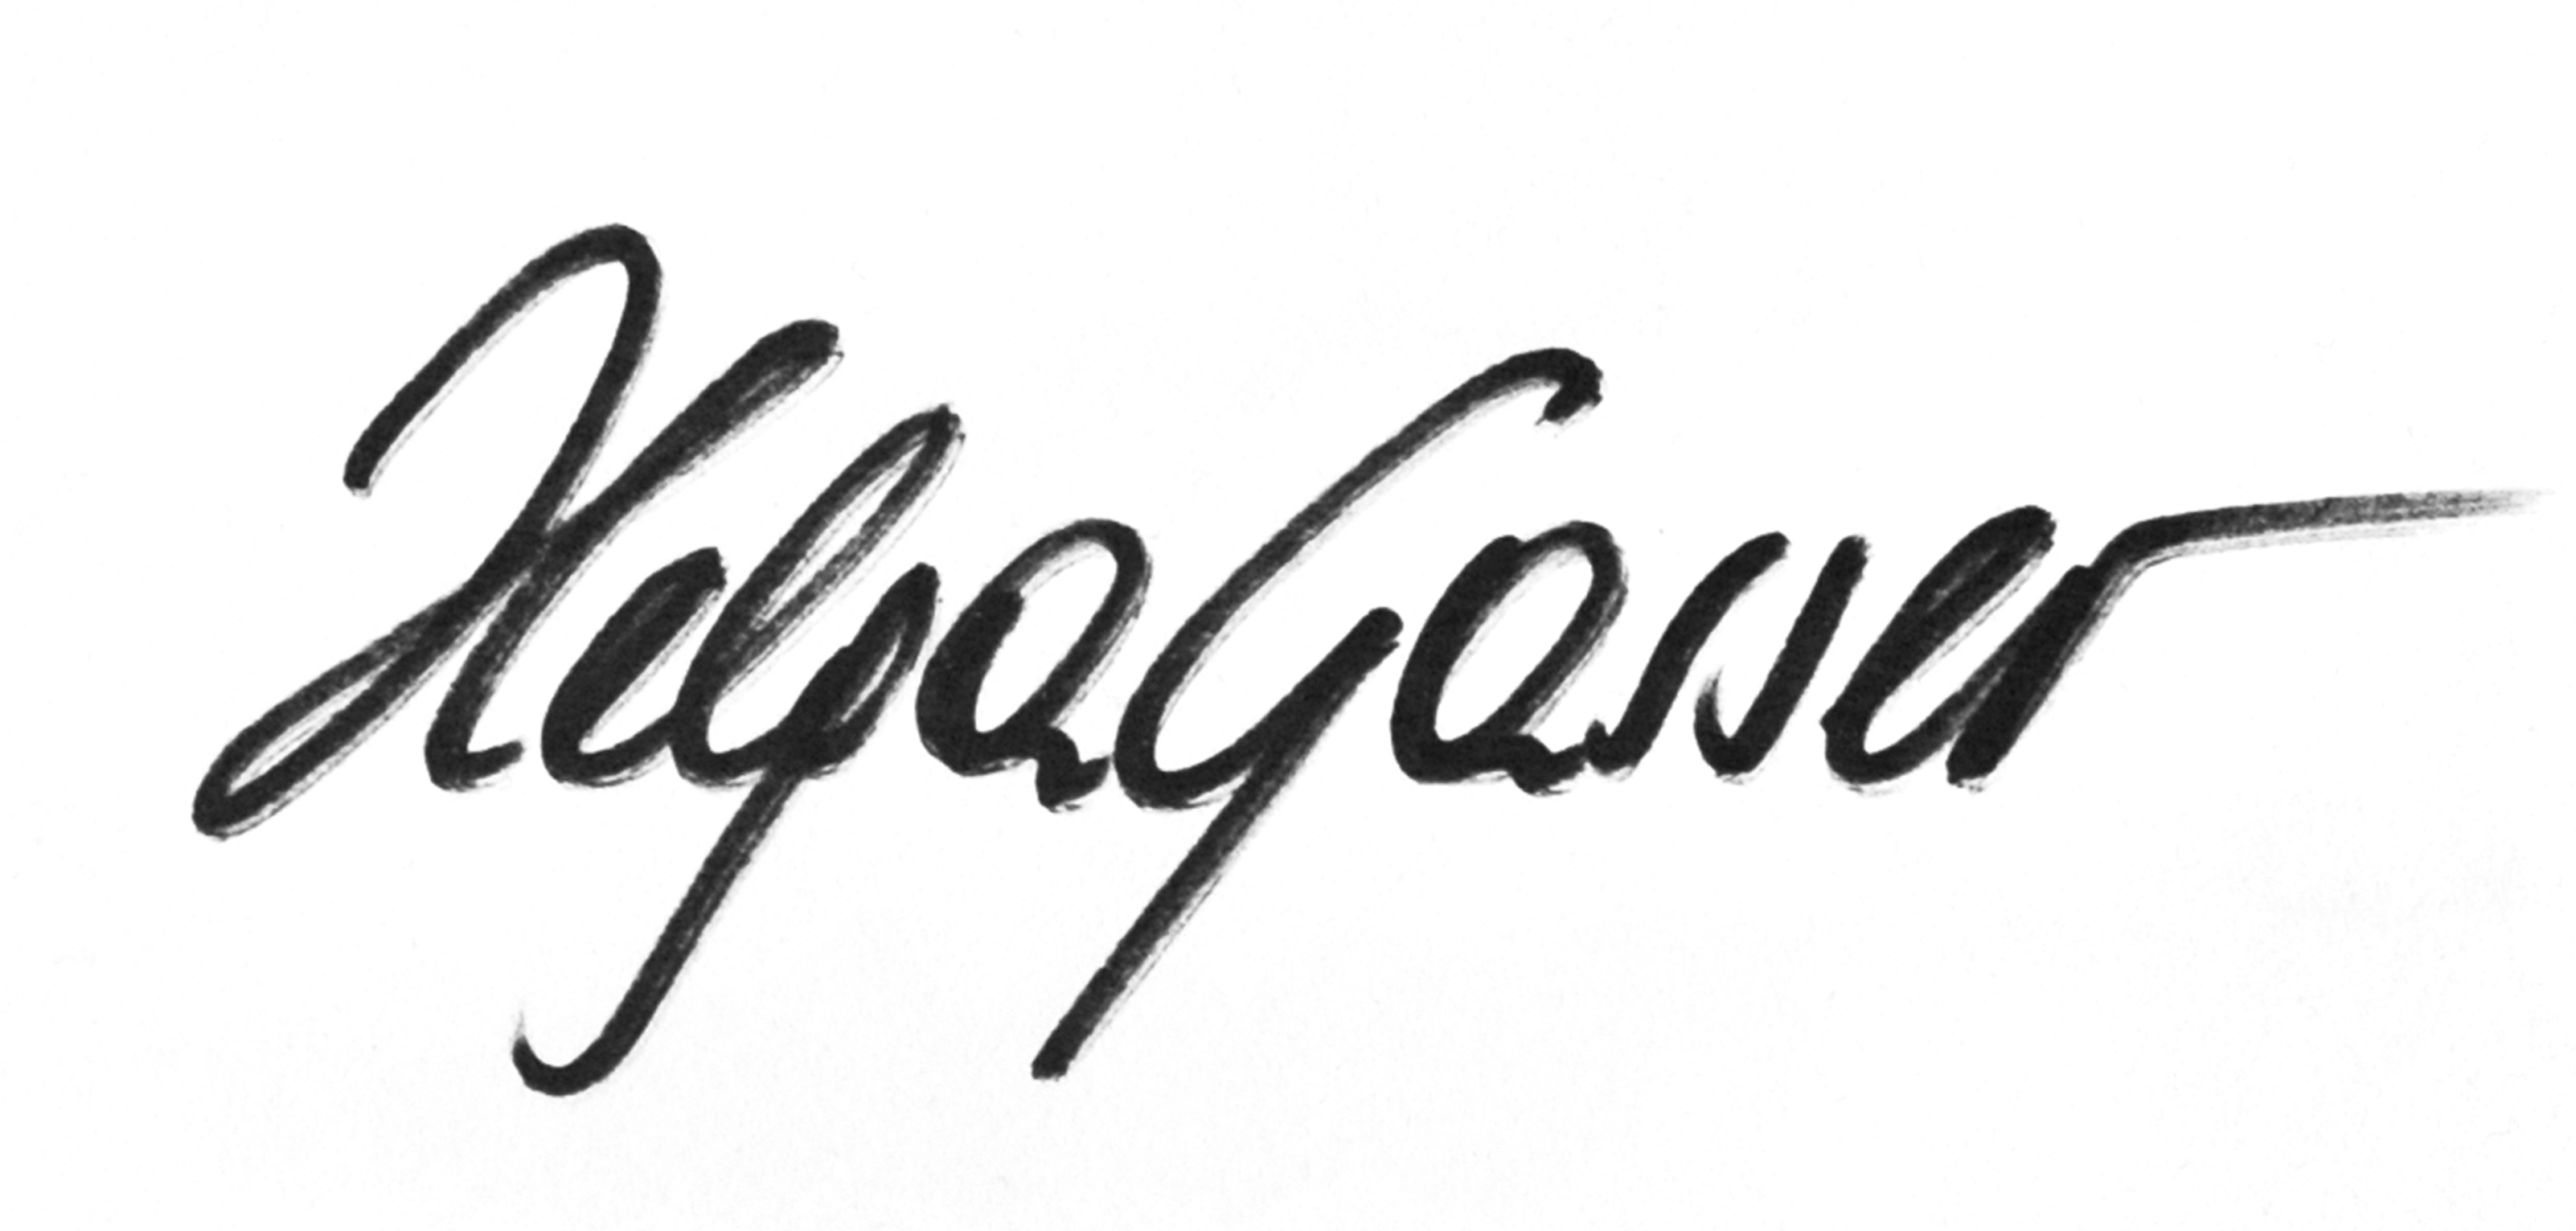 Helga Gasser's Signature